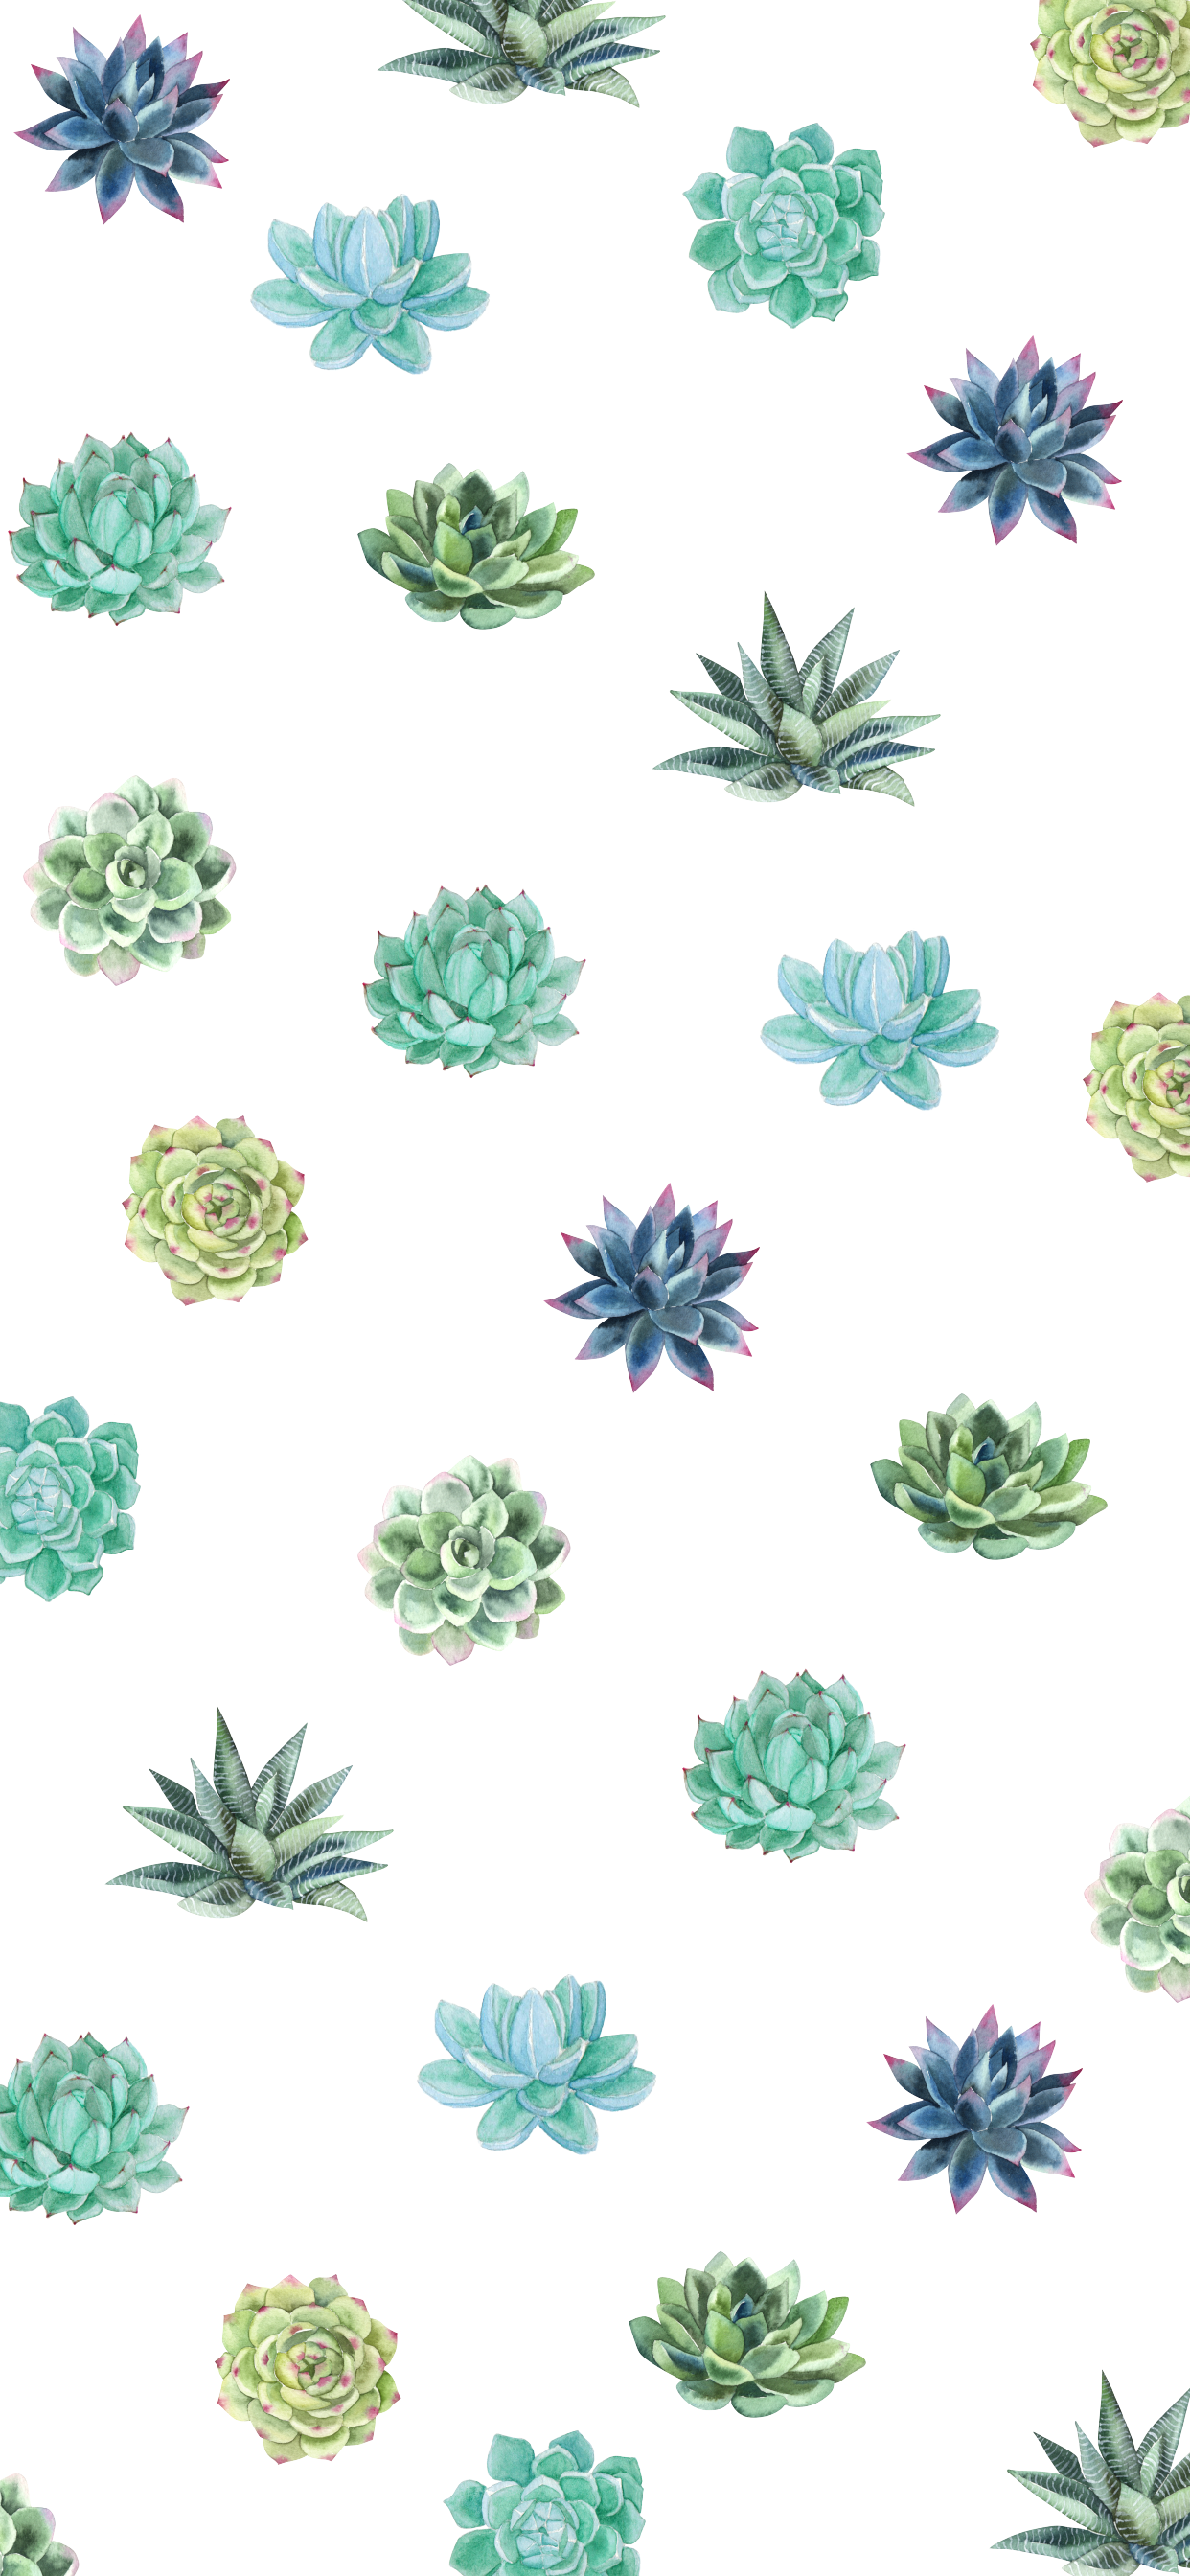 Summer Succulent Iphone Wallpaper Phone Wallpaper Iphone Summer Succulents Wallpaper Iphone Wallpaper Pineapple